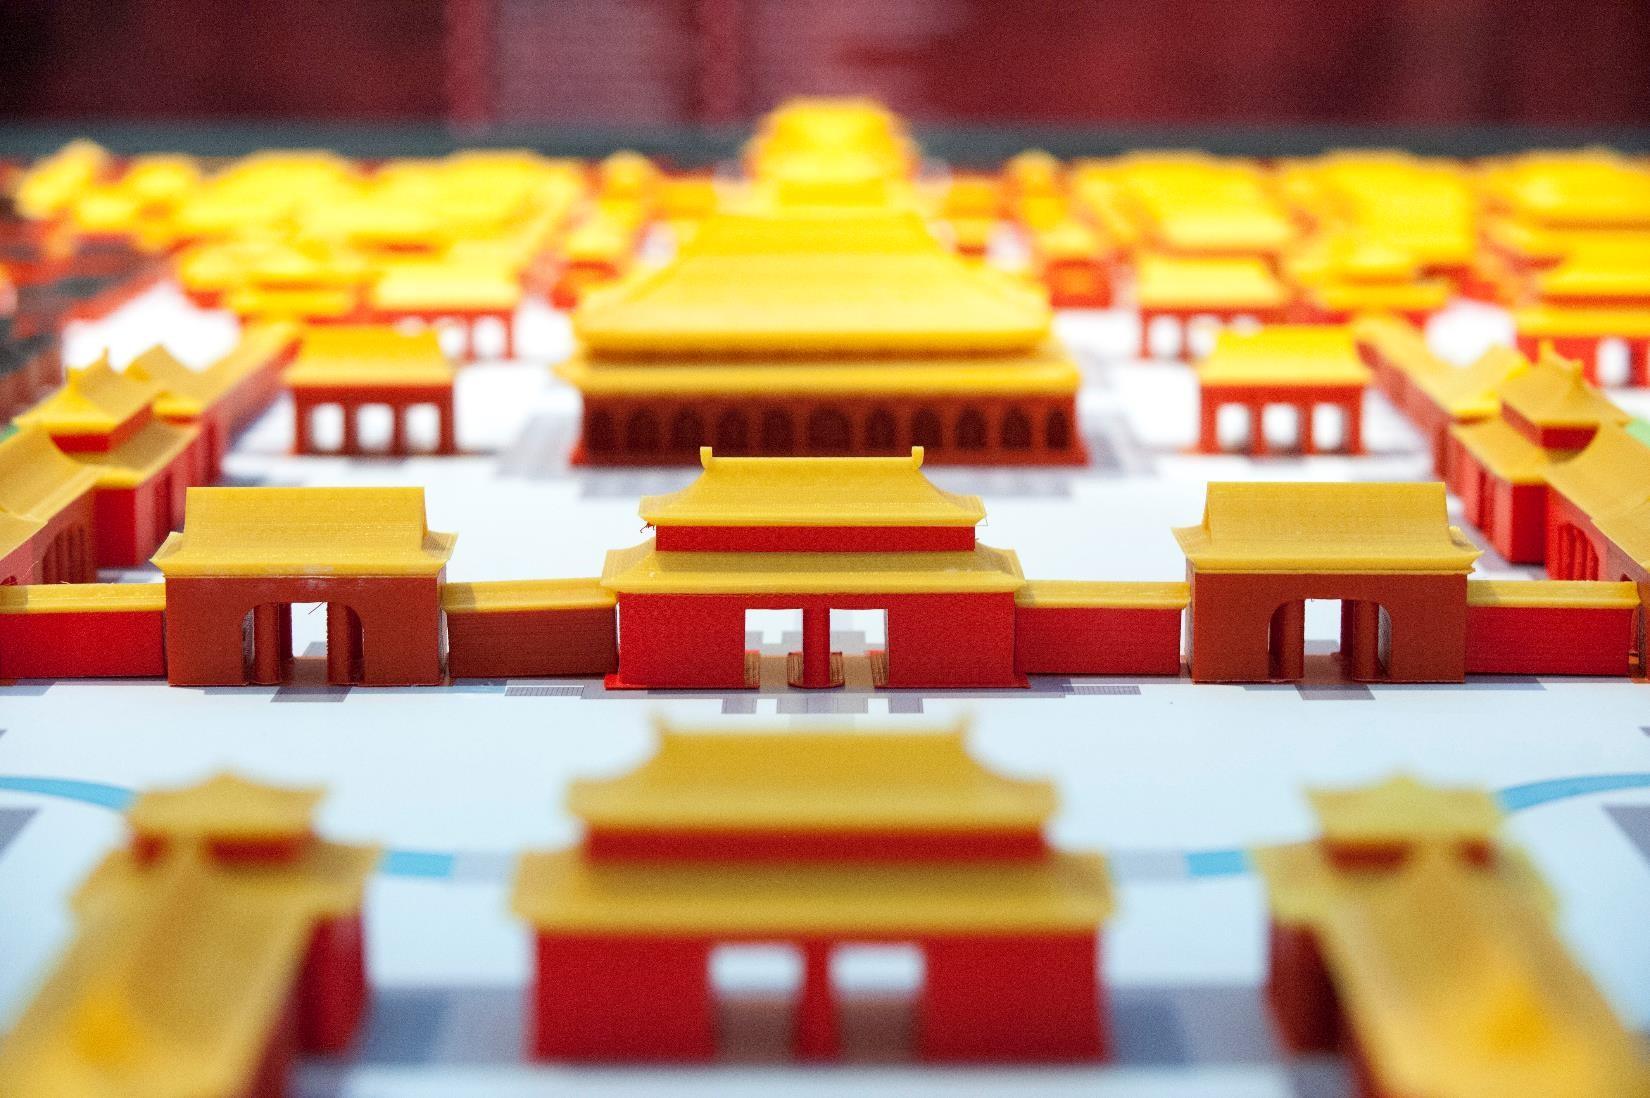 Leapfrog 3 Printerd forbidden city